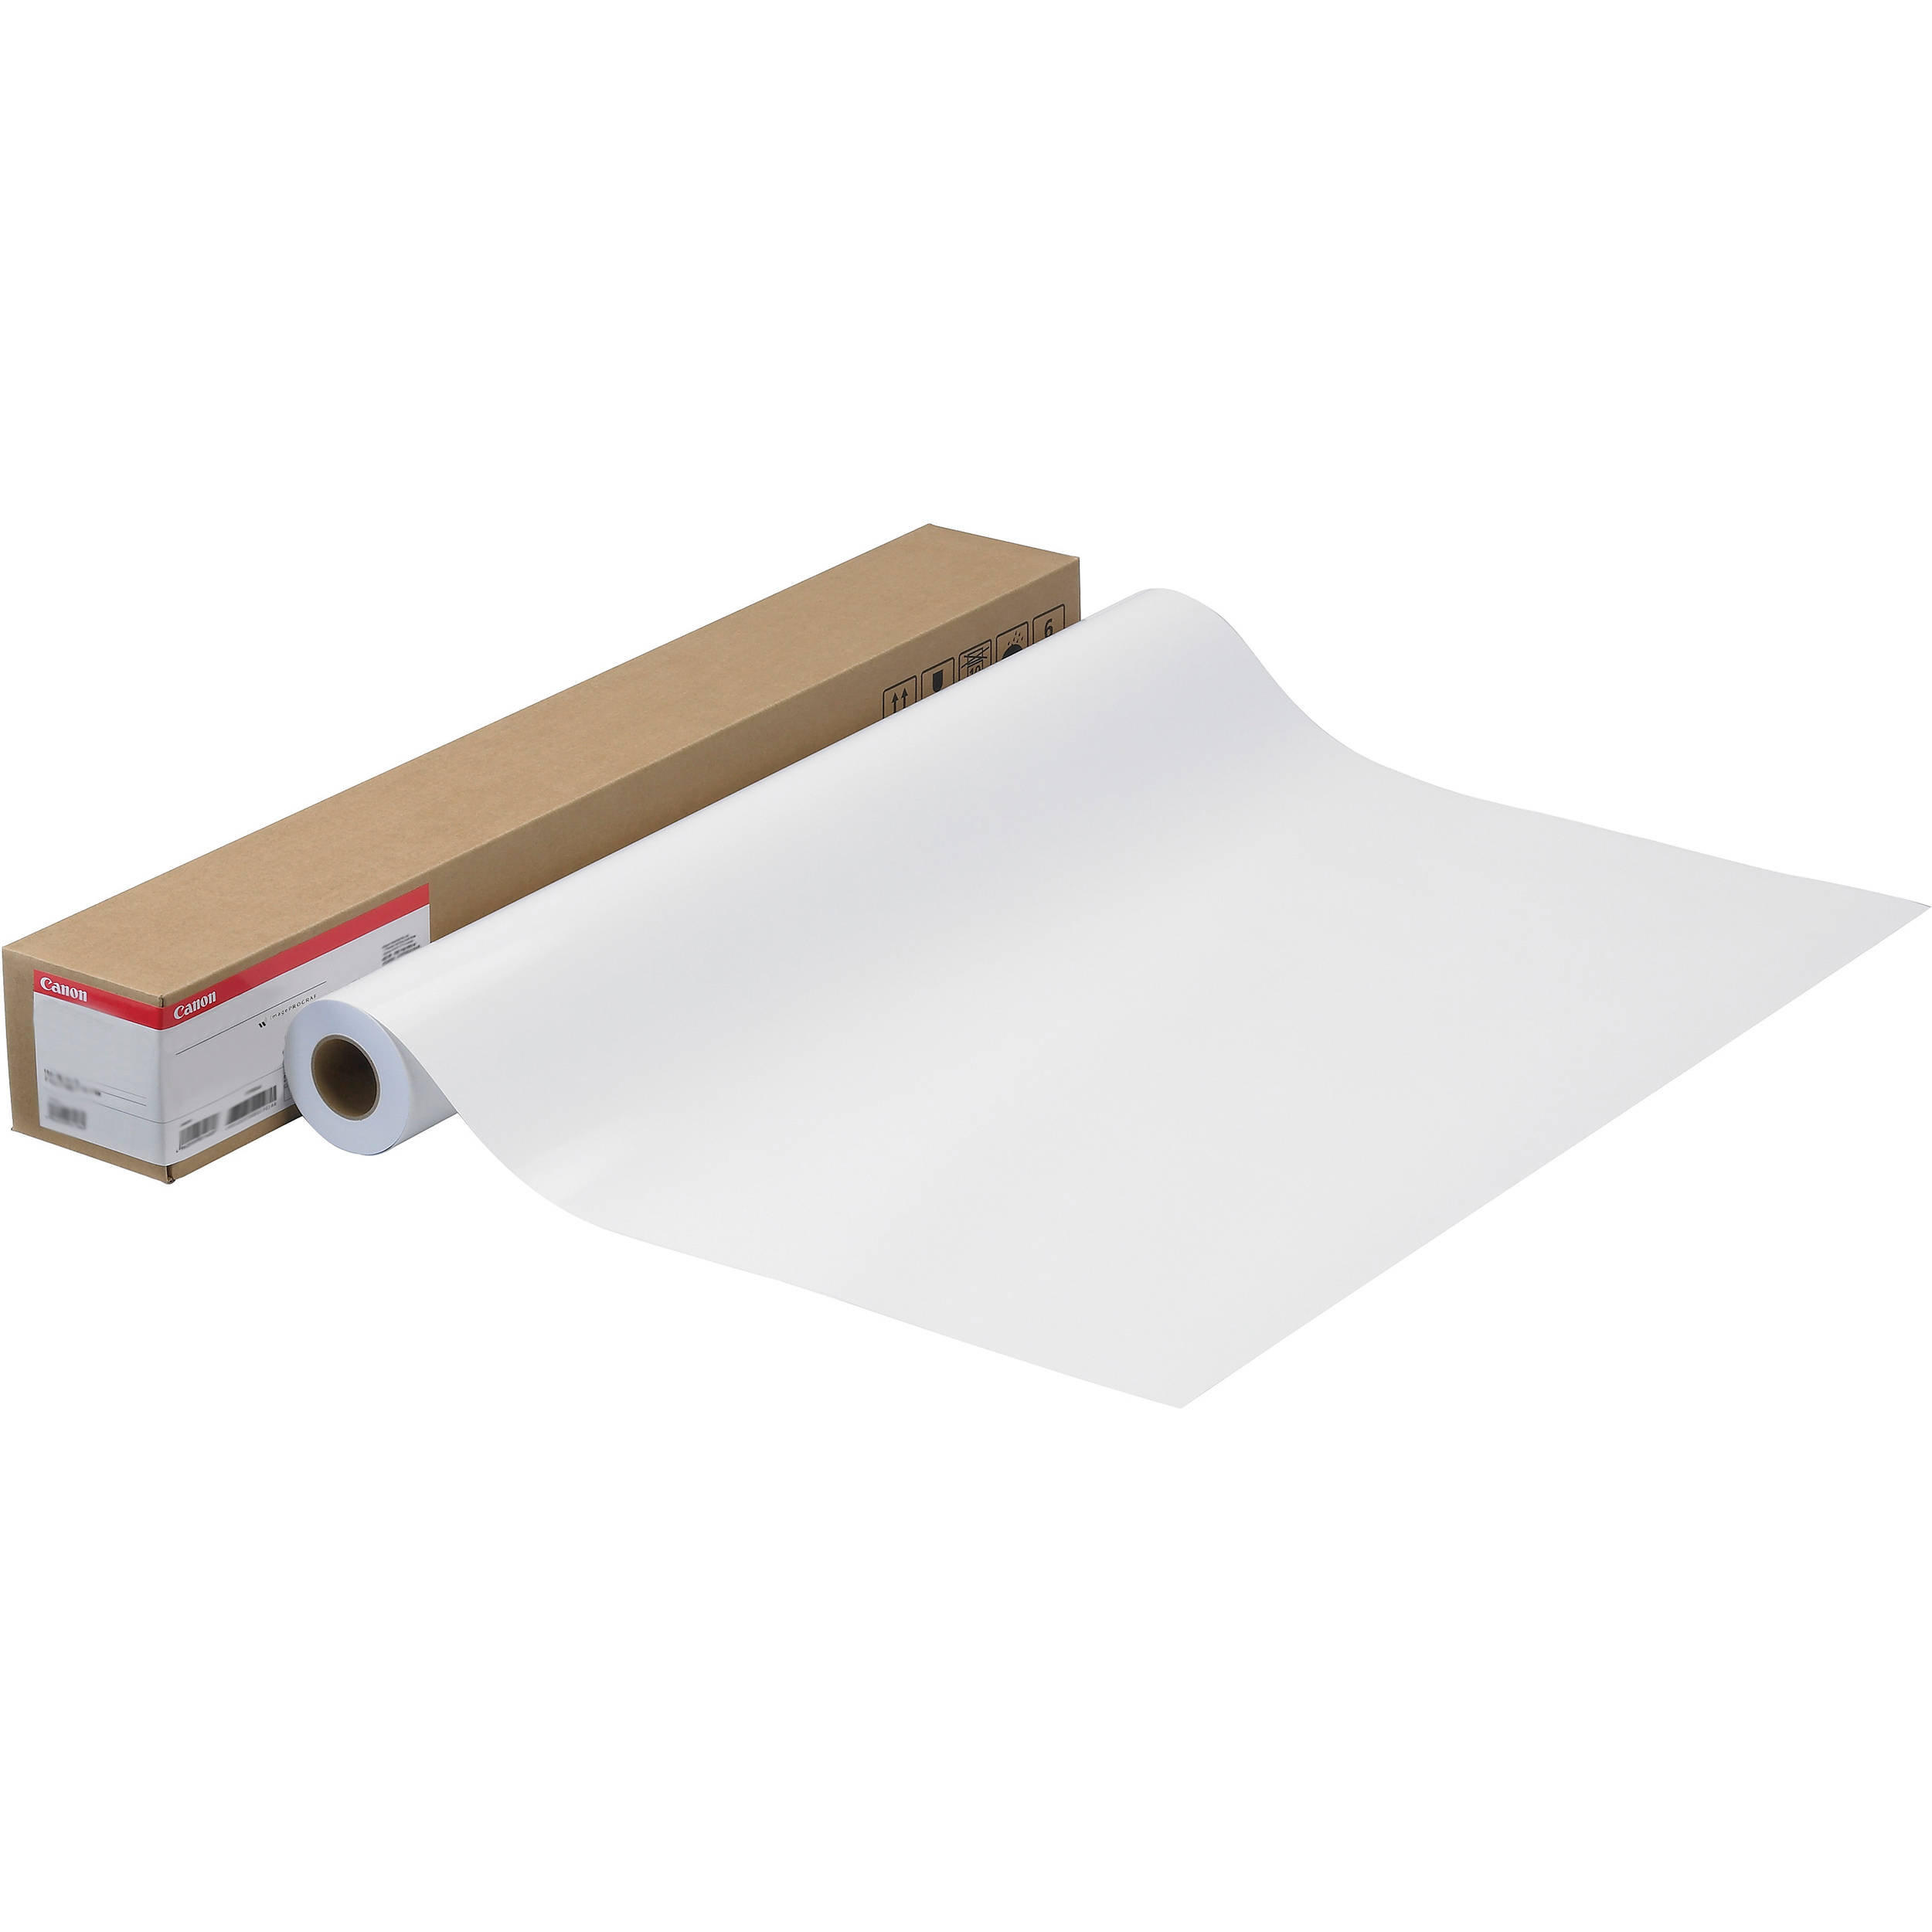 24 x 100 Glossy Photo Paper